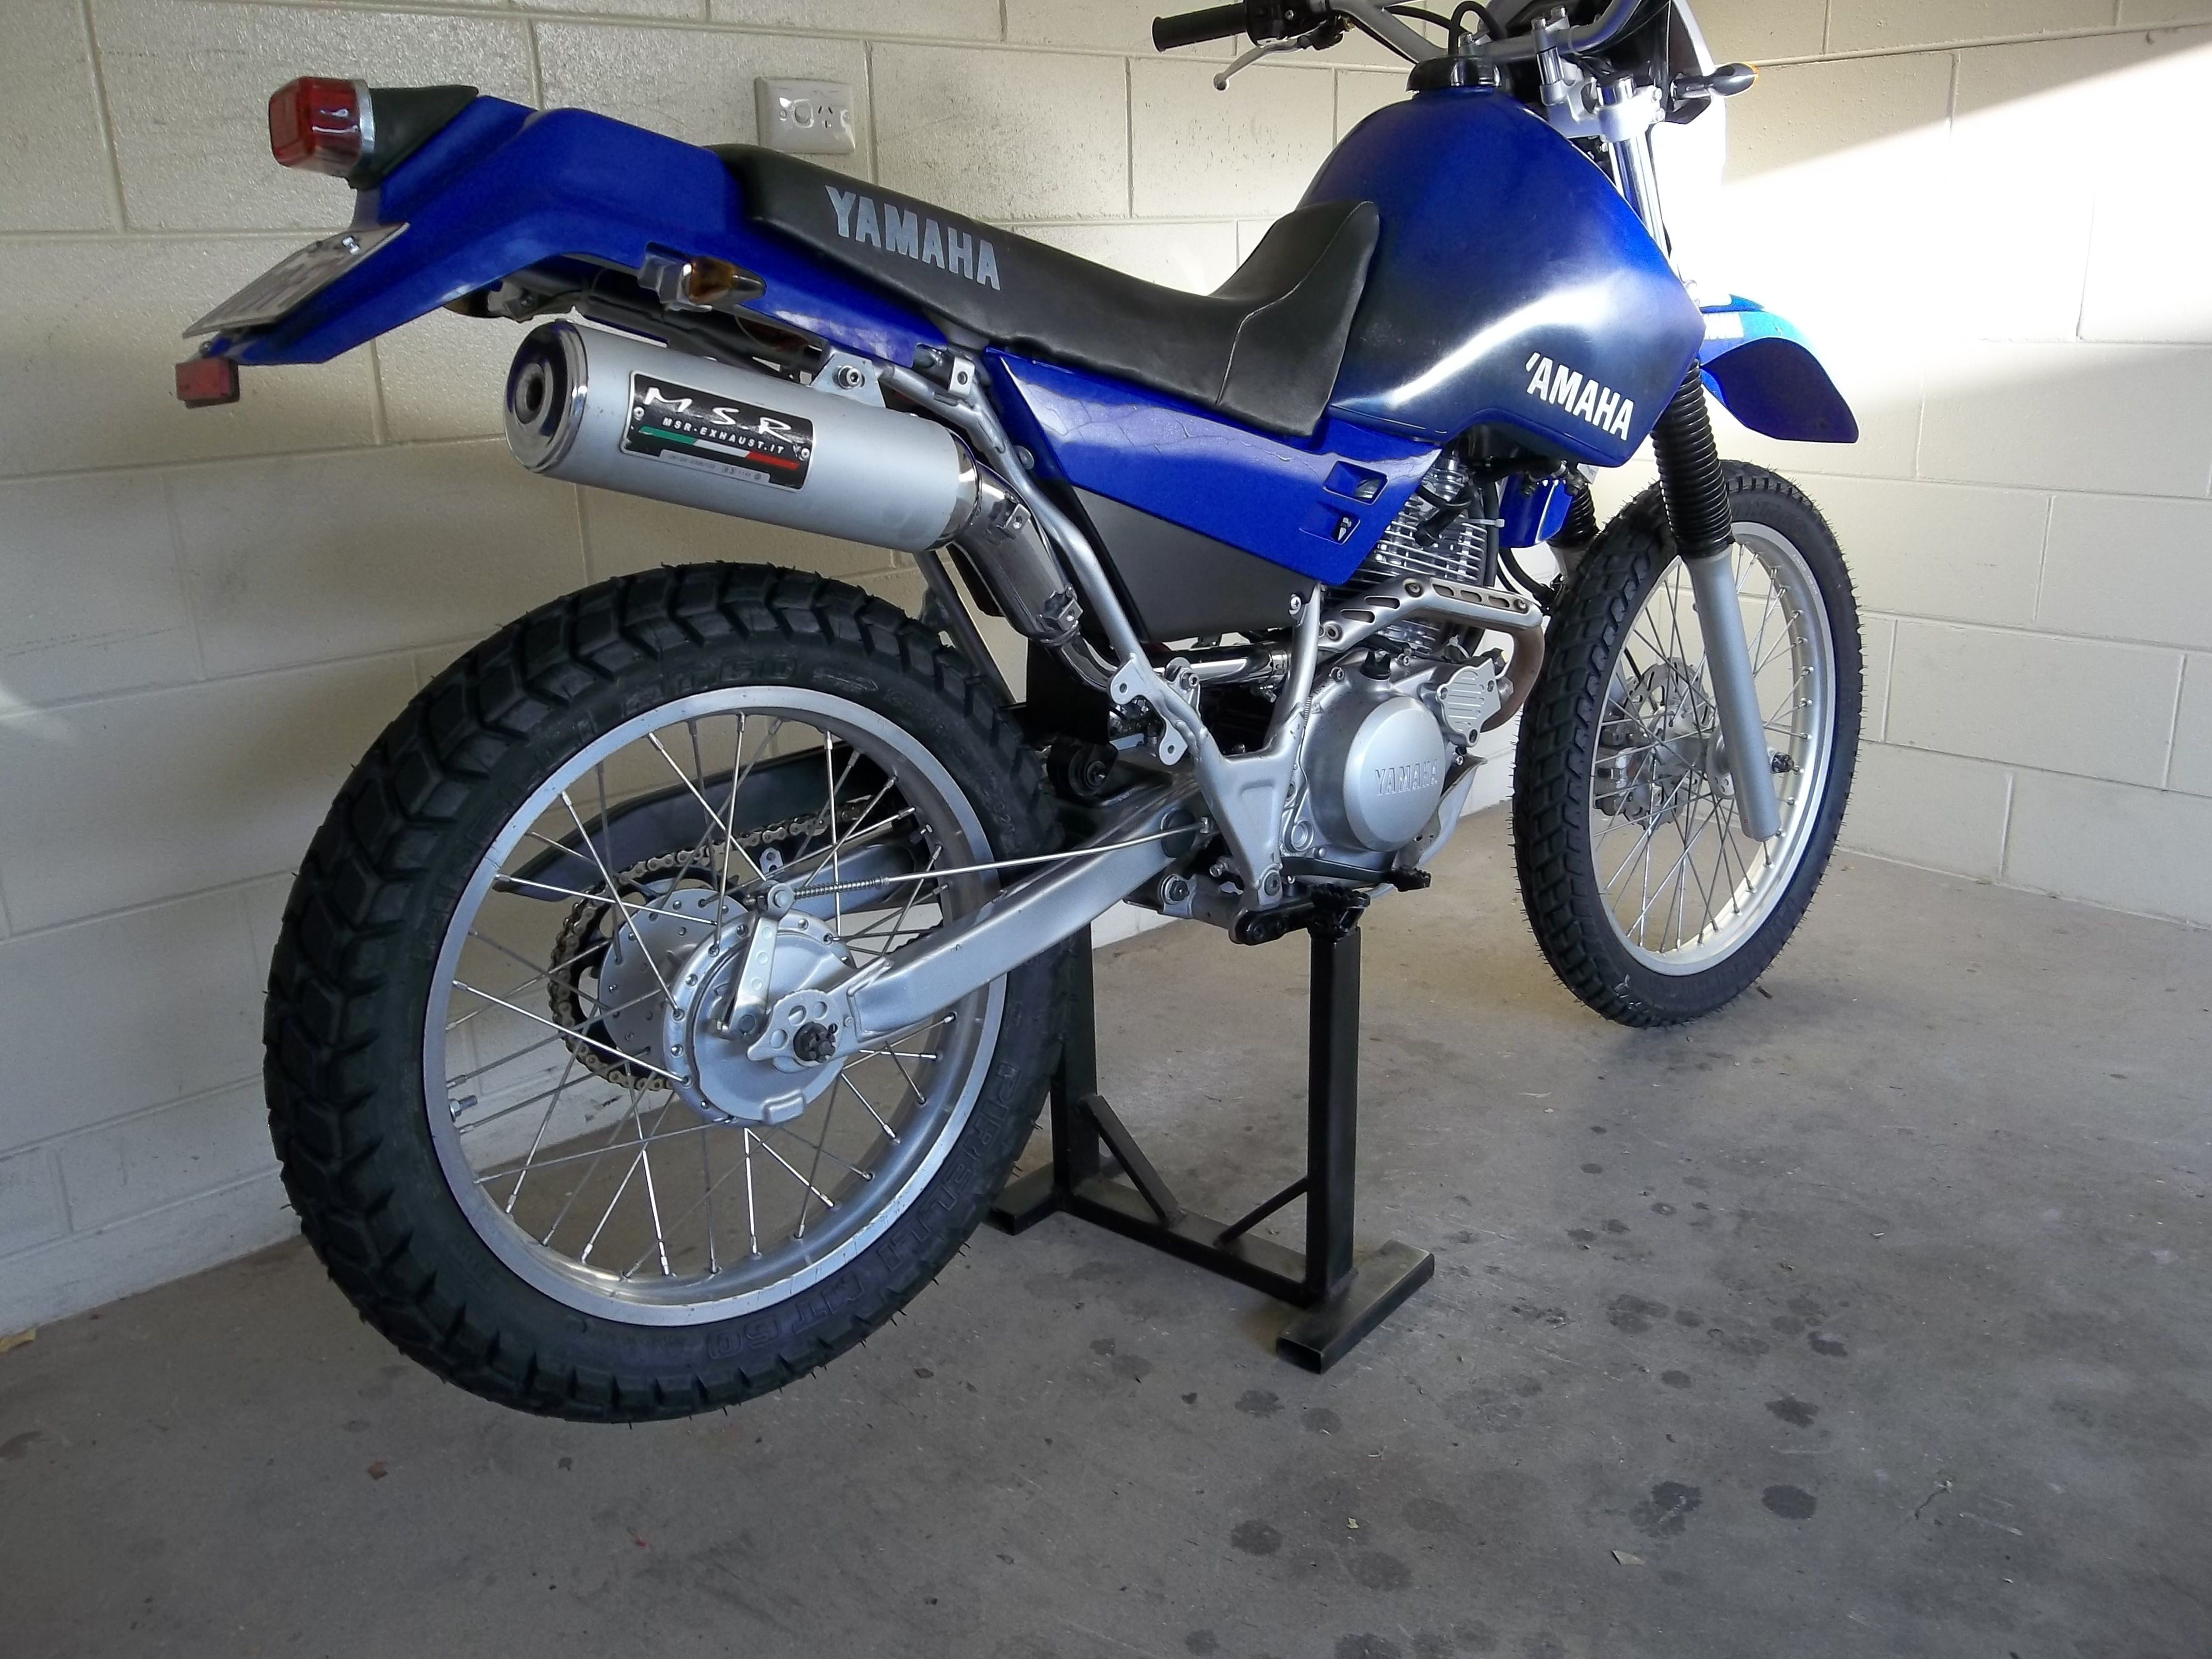 Yamaha Papercraft Motorcycle Yamaha Xt225 with after Market Exhaust Xt 225 Pinterest